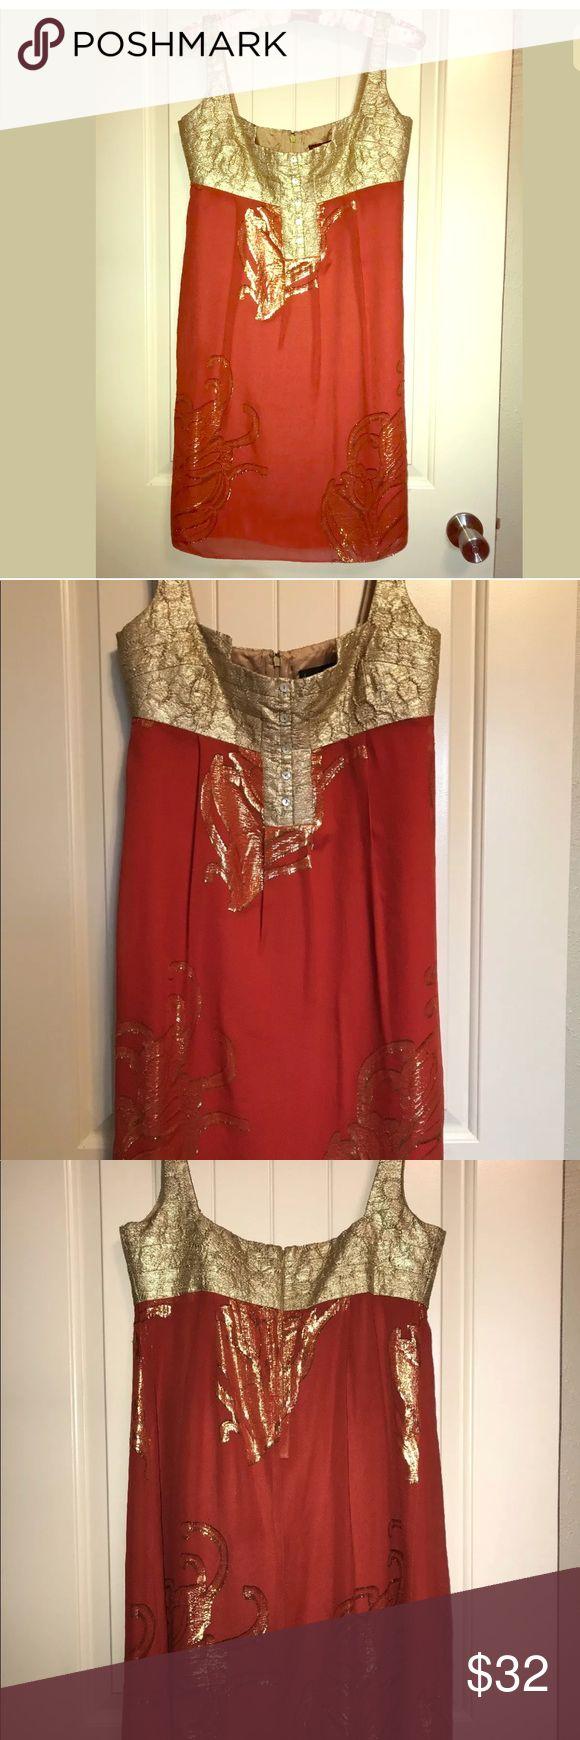 NICOLE MILLER Collection Gold Brocade Dress ~ Sz 8 NICOLE MILLER Collection Gold Brocade Lame' Party Dress Burnt Orange ~ Sz 8 Nicole Miller Dresses Midi